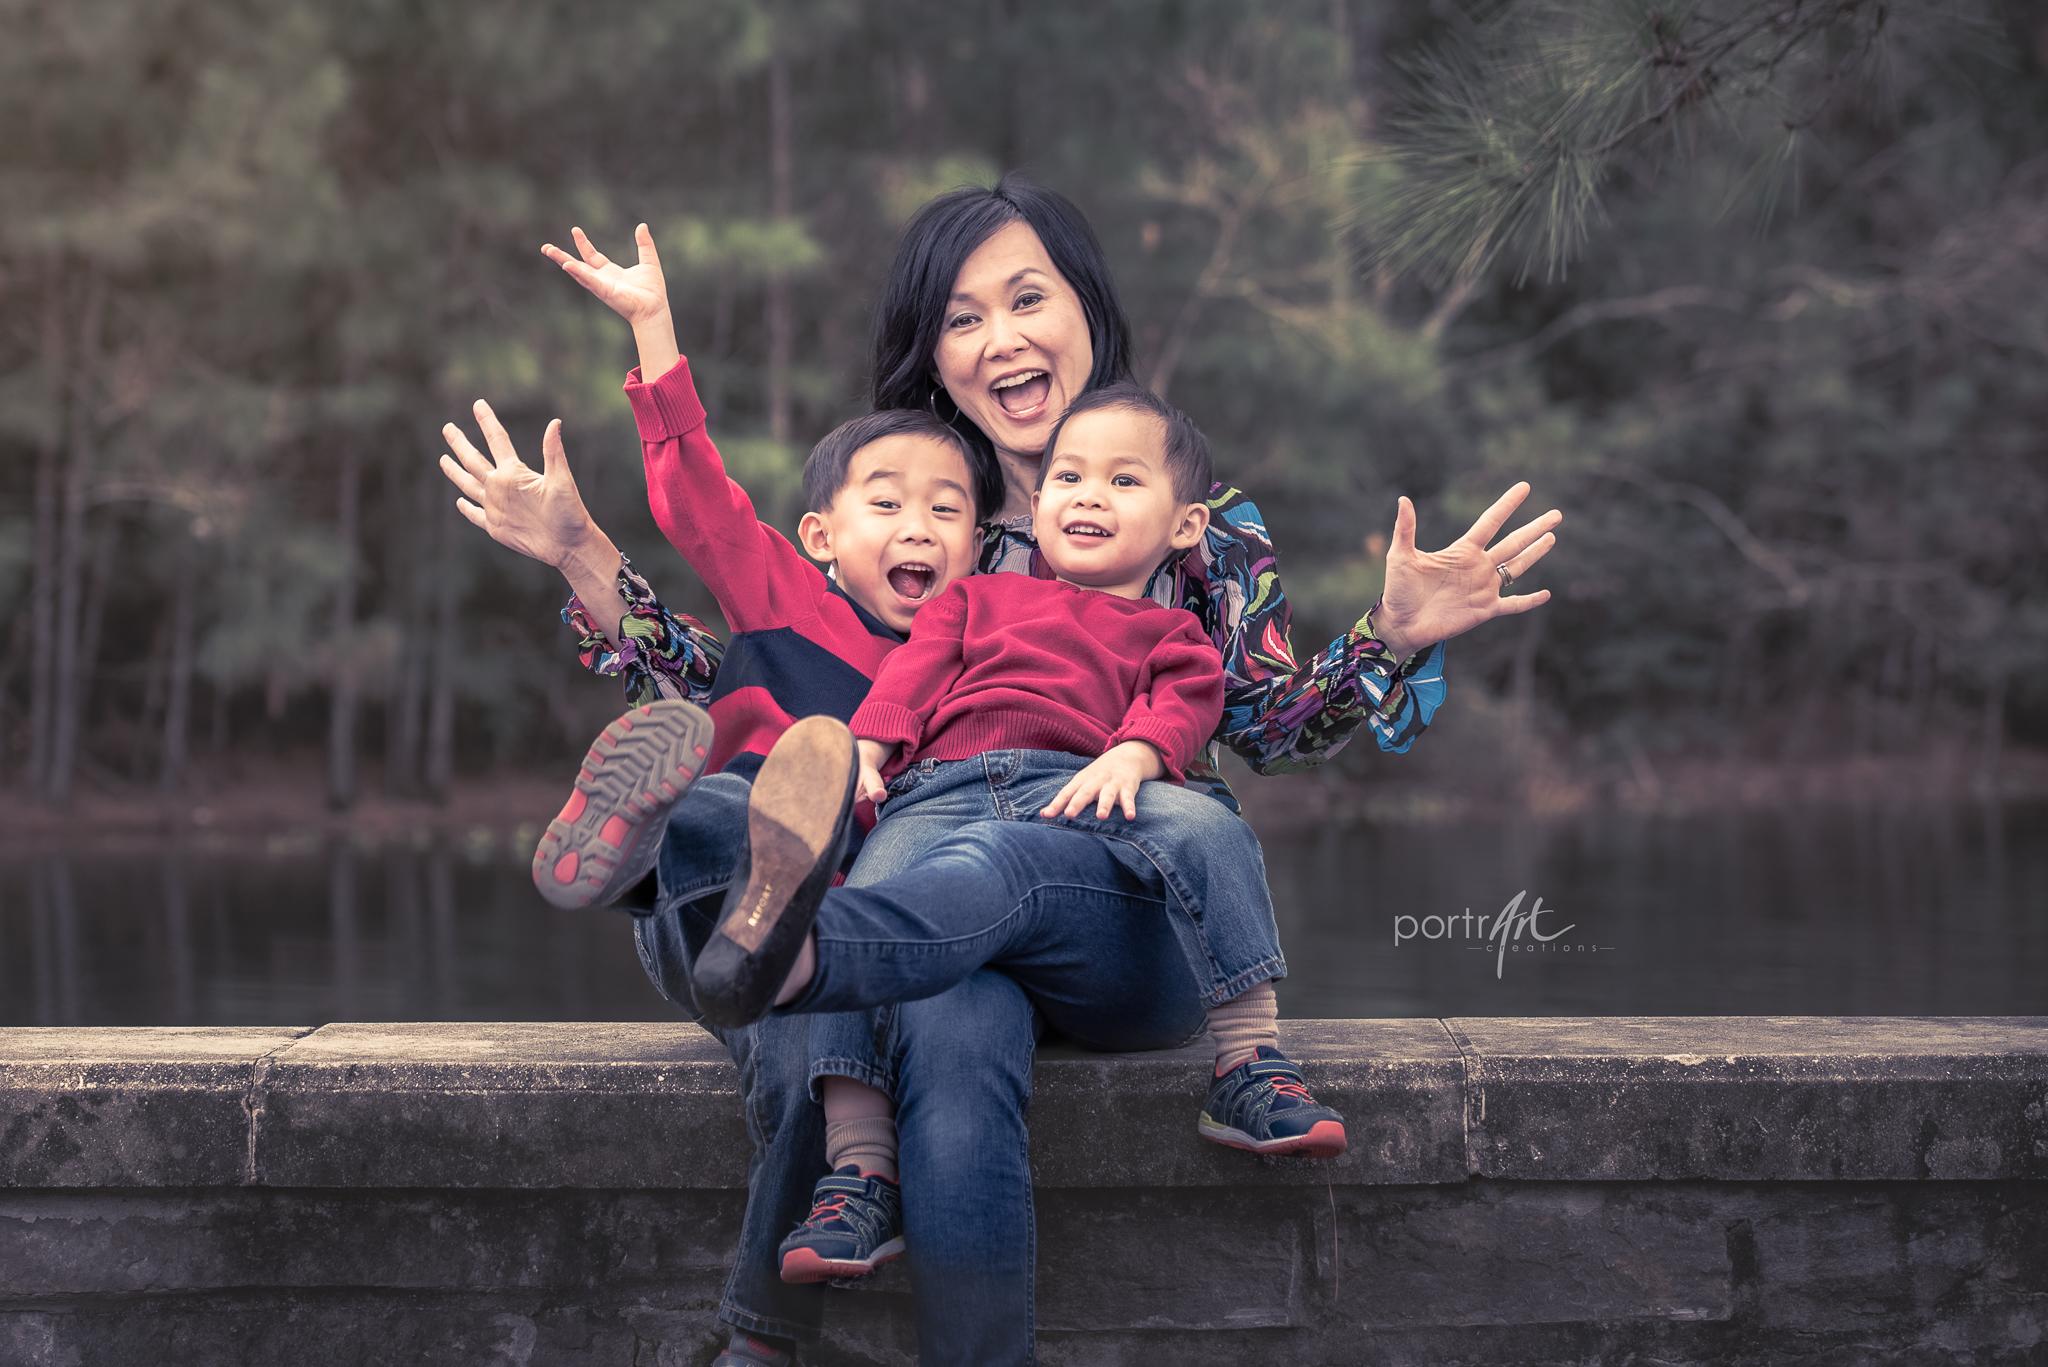 San Diego Photographer - Family